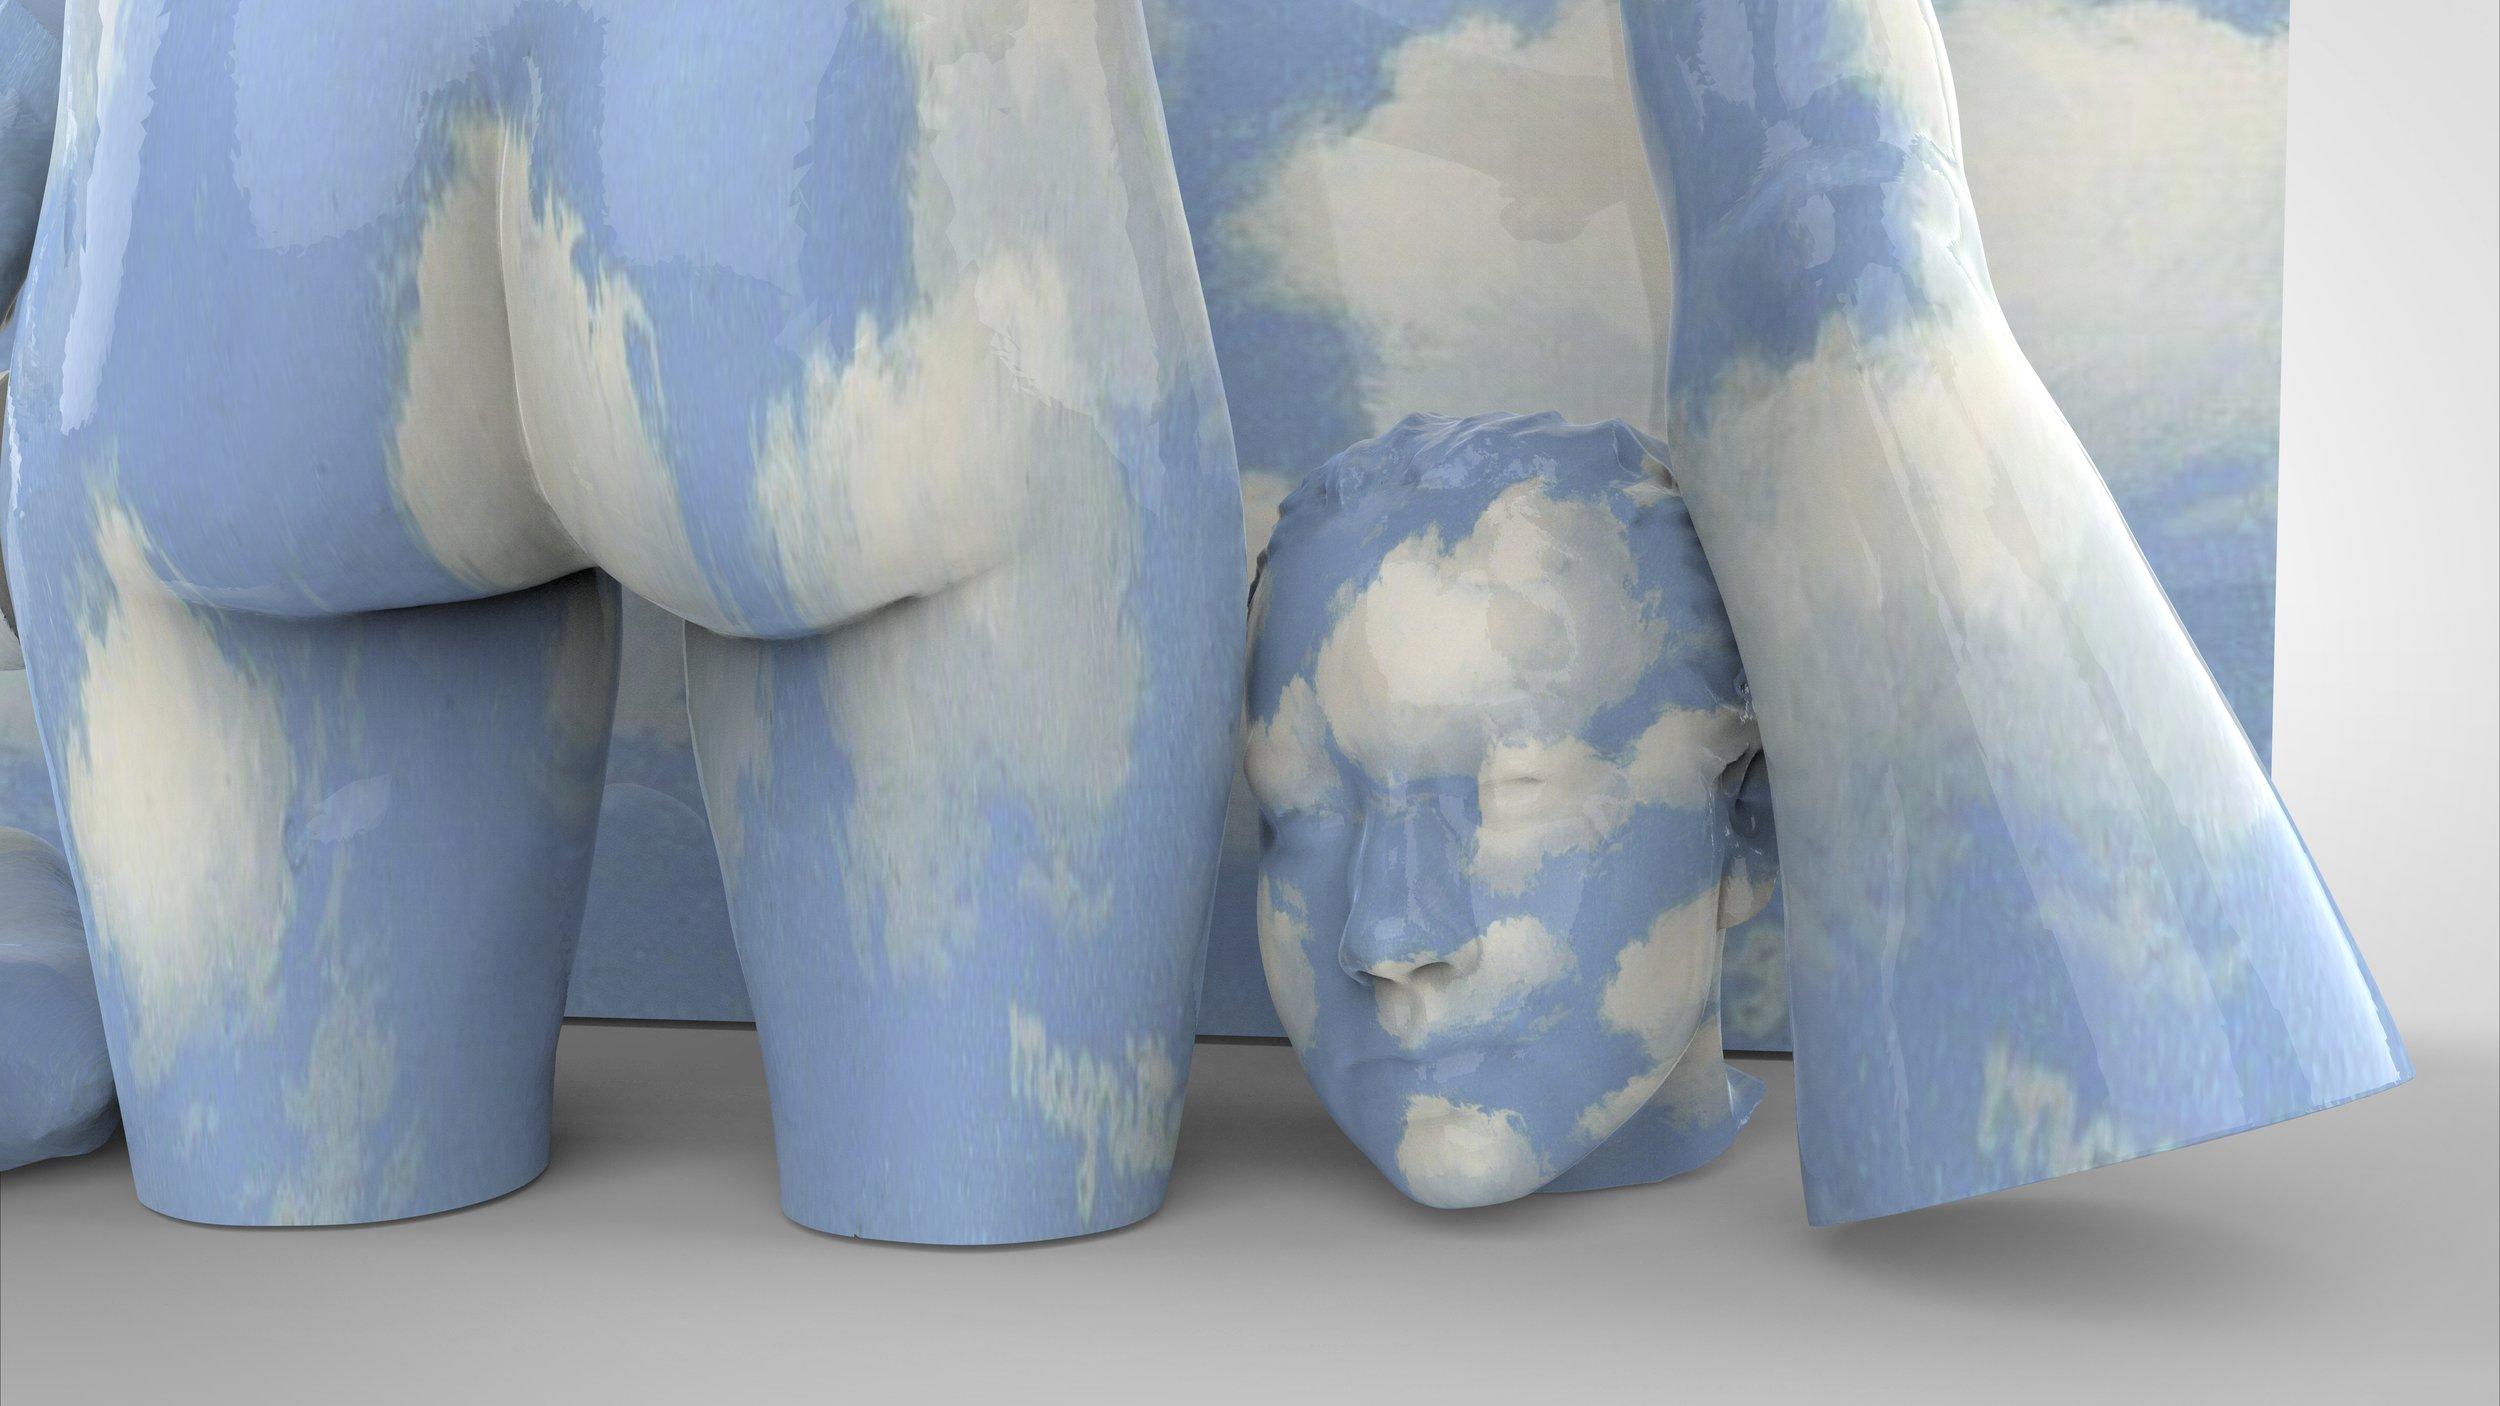 magritte_render_1.6 (1).jpg